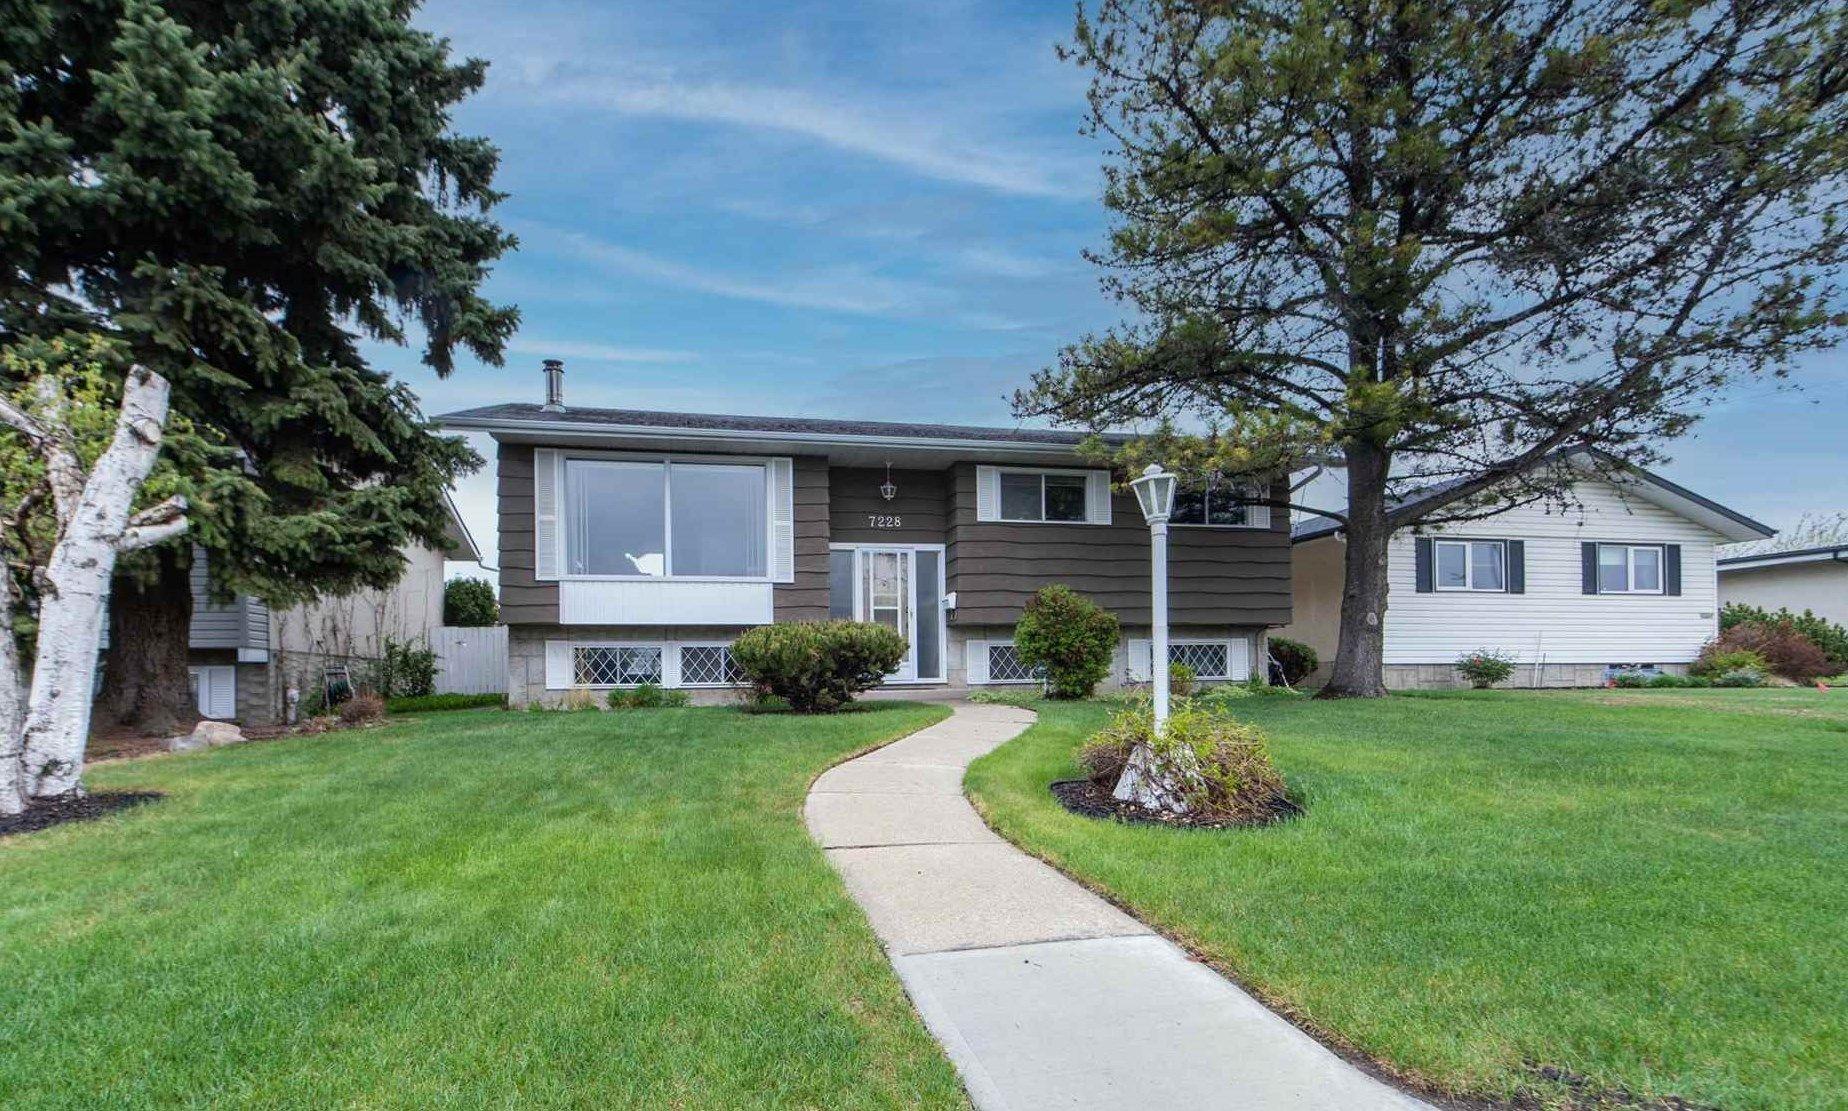 Main Photo: 7228 152A Avenue in Edmonton: Zone 02 House for sale : MLS®# E4245820